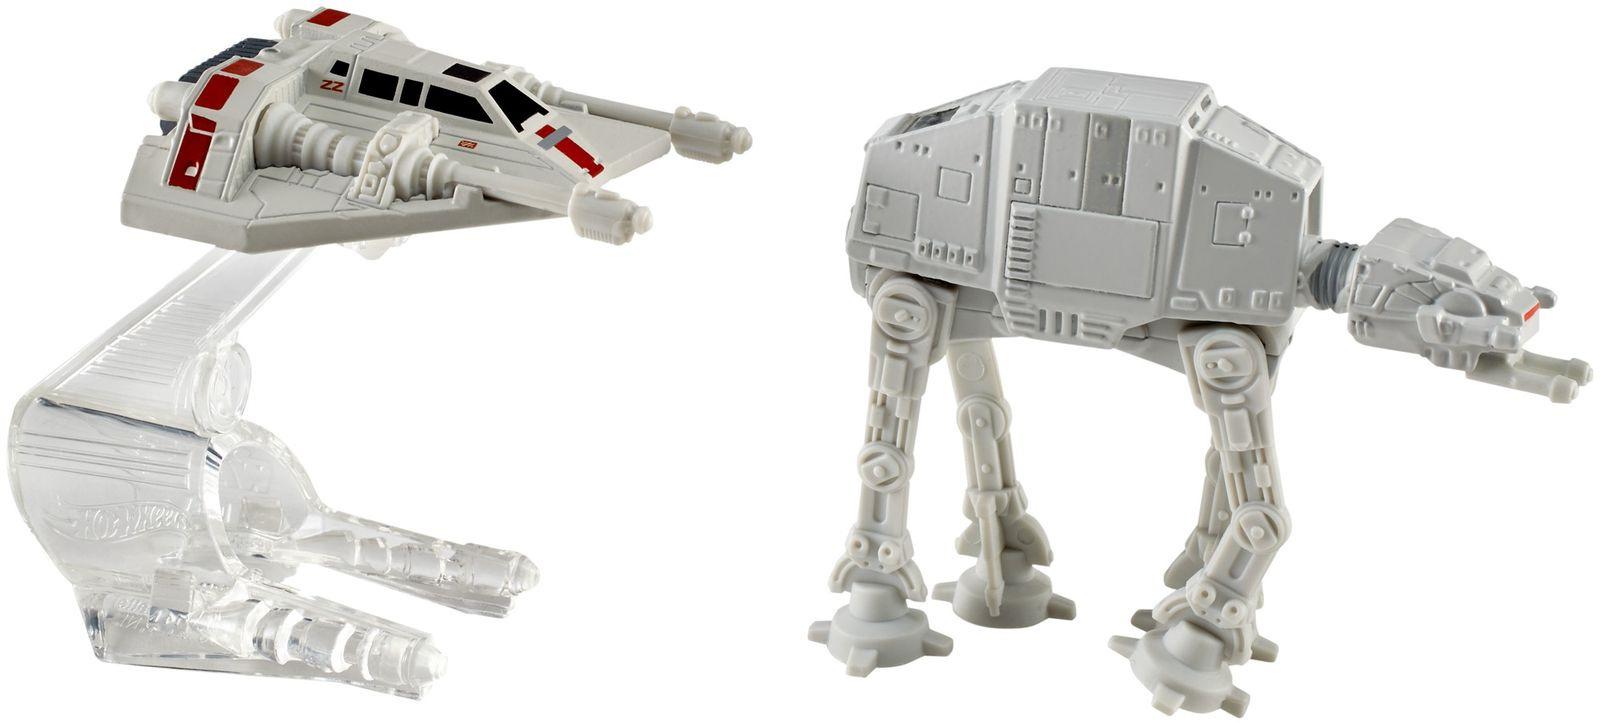 Hot Wheels Star Wars Звездные корабли AT-AT vs Rebel Snowspeeder набор mattel hot wheels 2 звездных корабля star wars tie fighter vs ghost cgw90